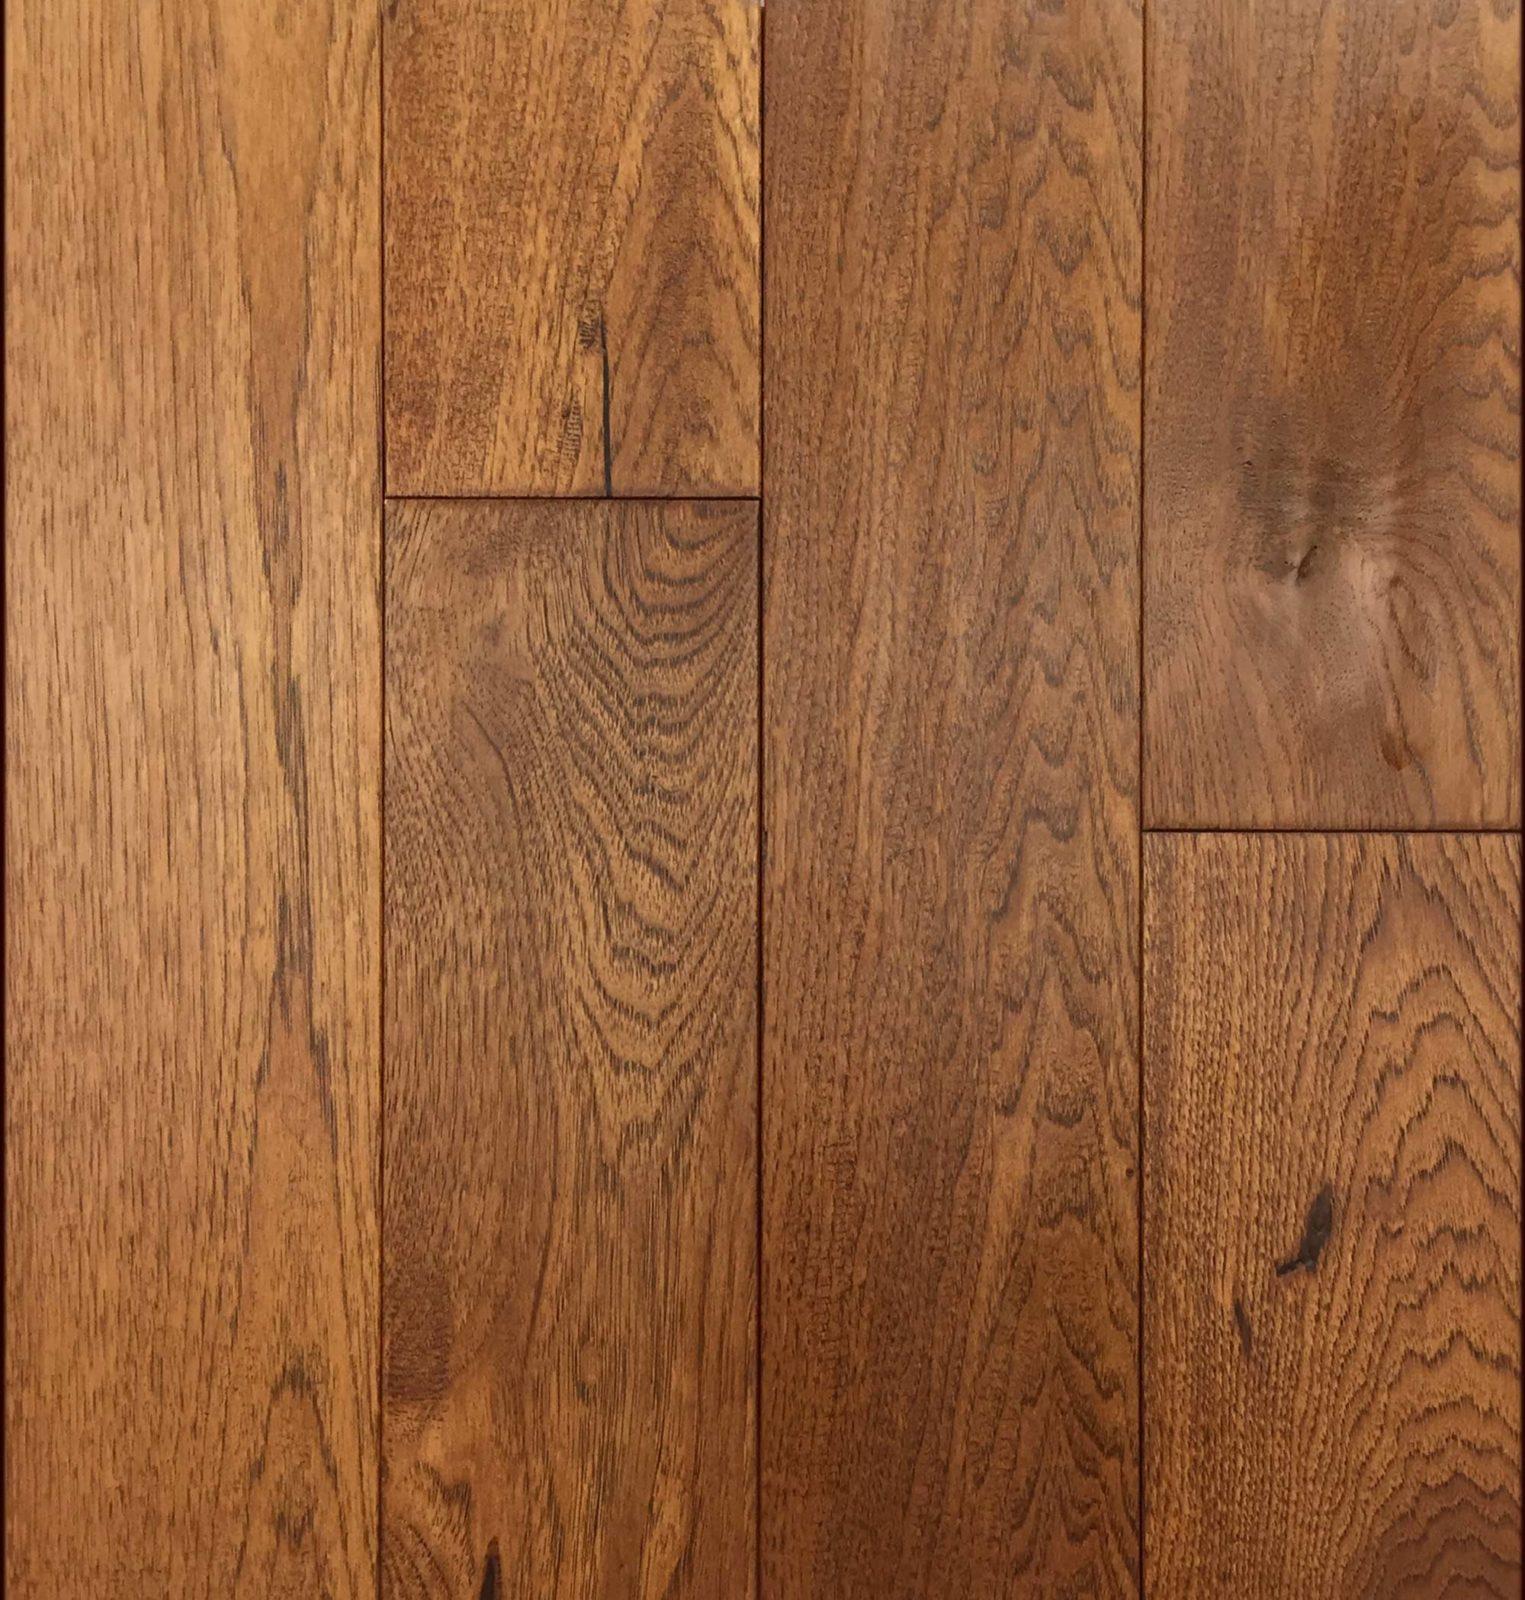 3 4 Hardwood Flooring natural peru tigerwood hardwood flooring 34 Hickory Saddle Handscraped Flooring